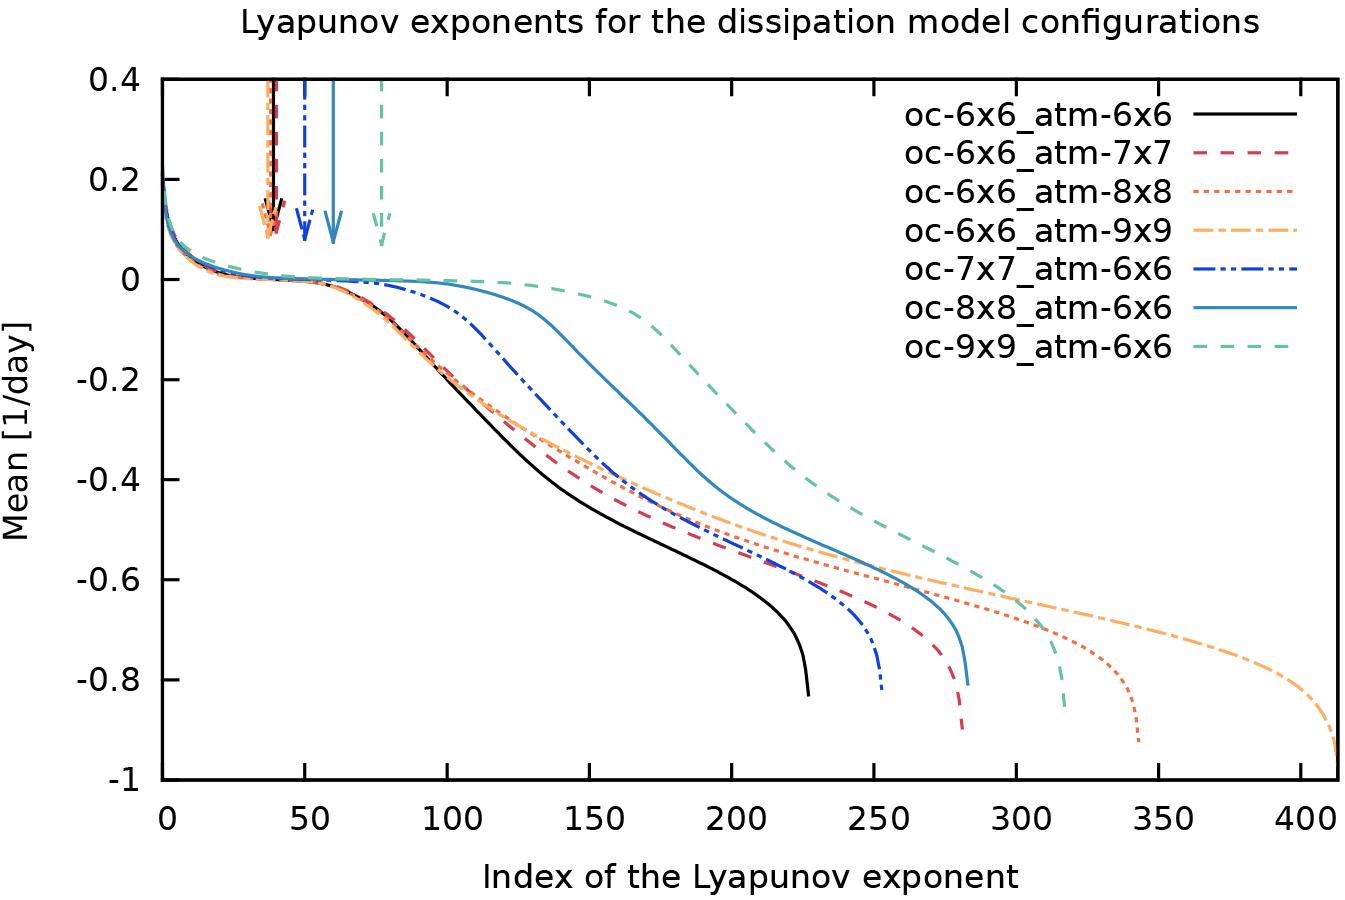 NPG - Exploring the Lyapunov instability properties of high